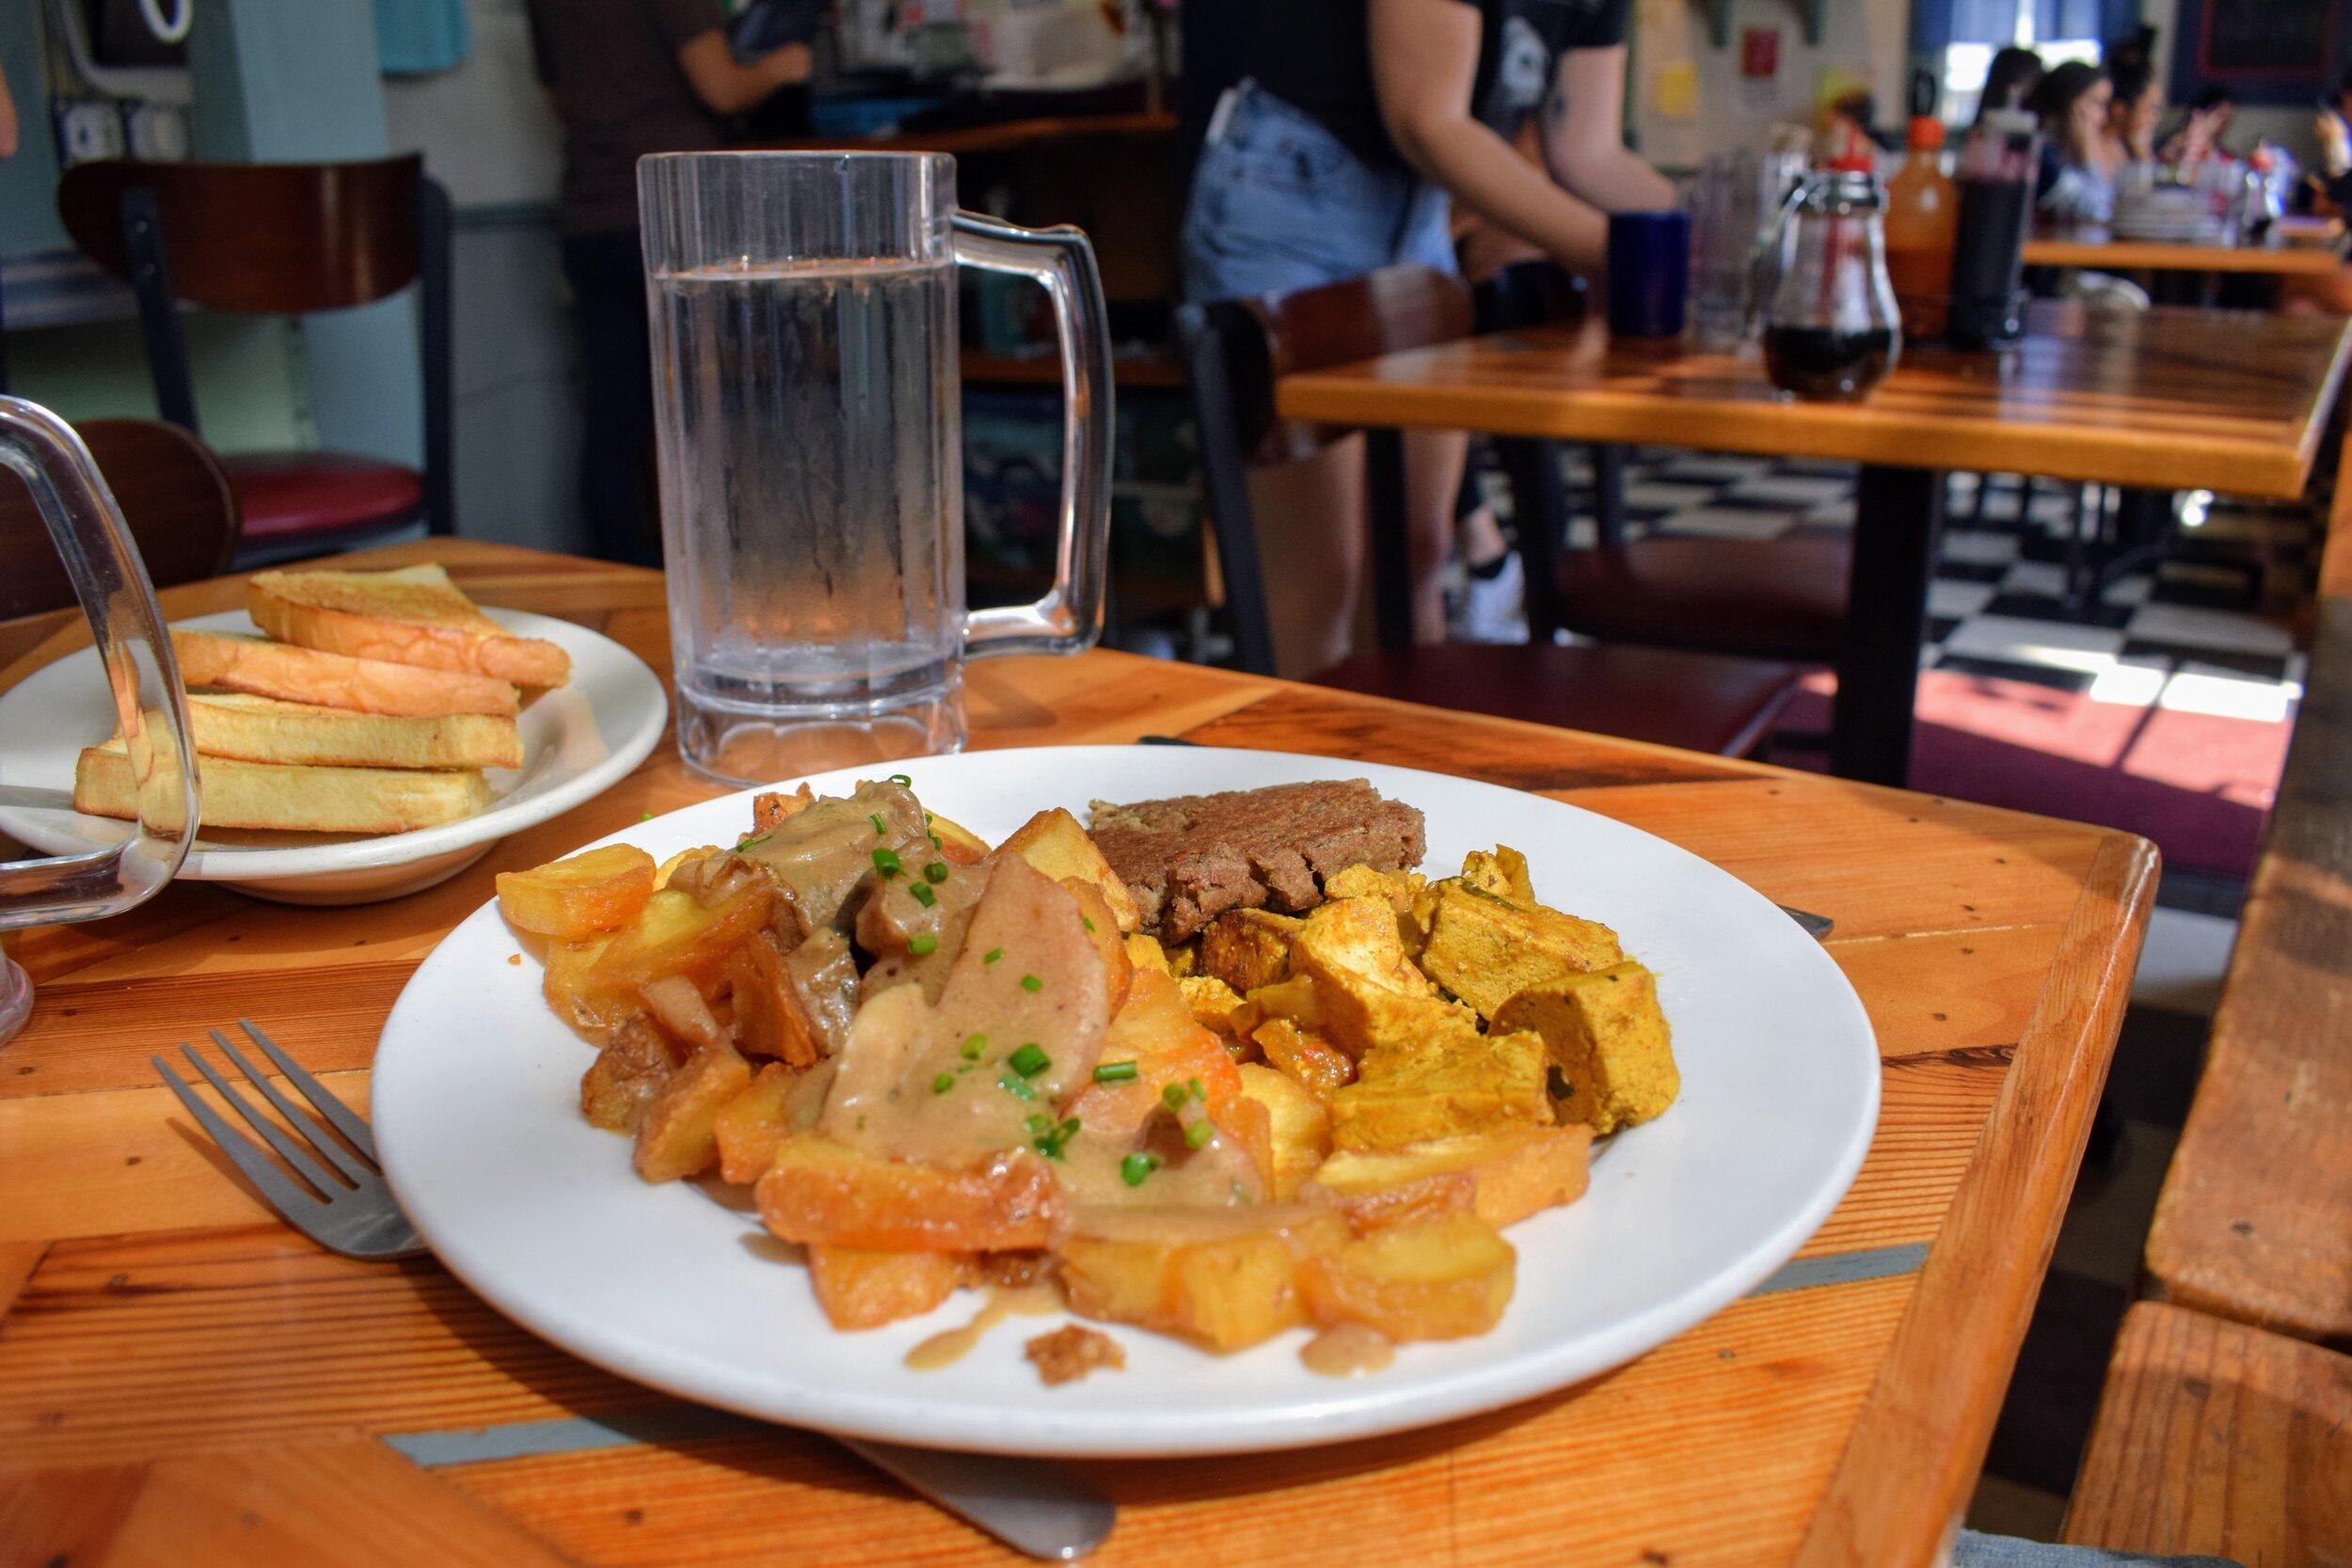 The Lambert's Platter vegan breakfast at Little Grill Collective.